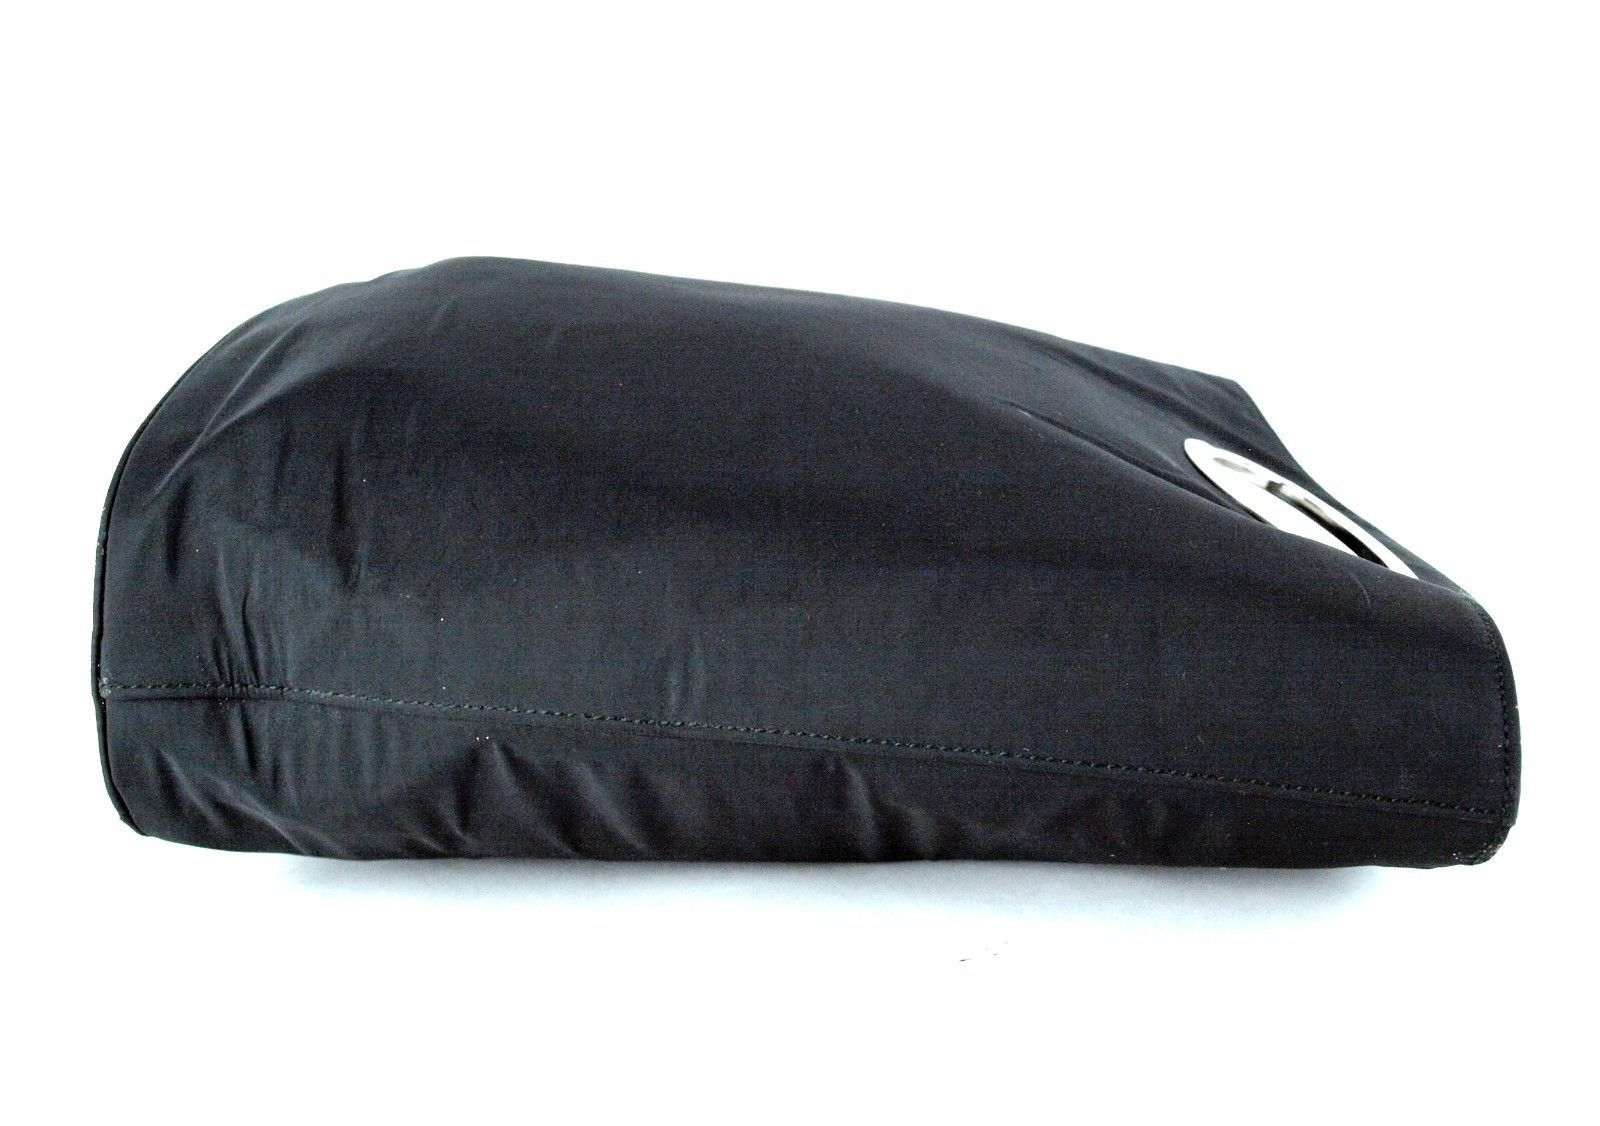 Authentic GUCCI Black Nylon Double Chamber Hand Bag Handbag Purse Italy